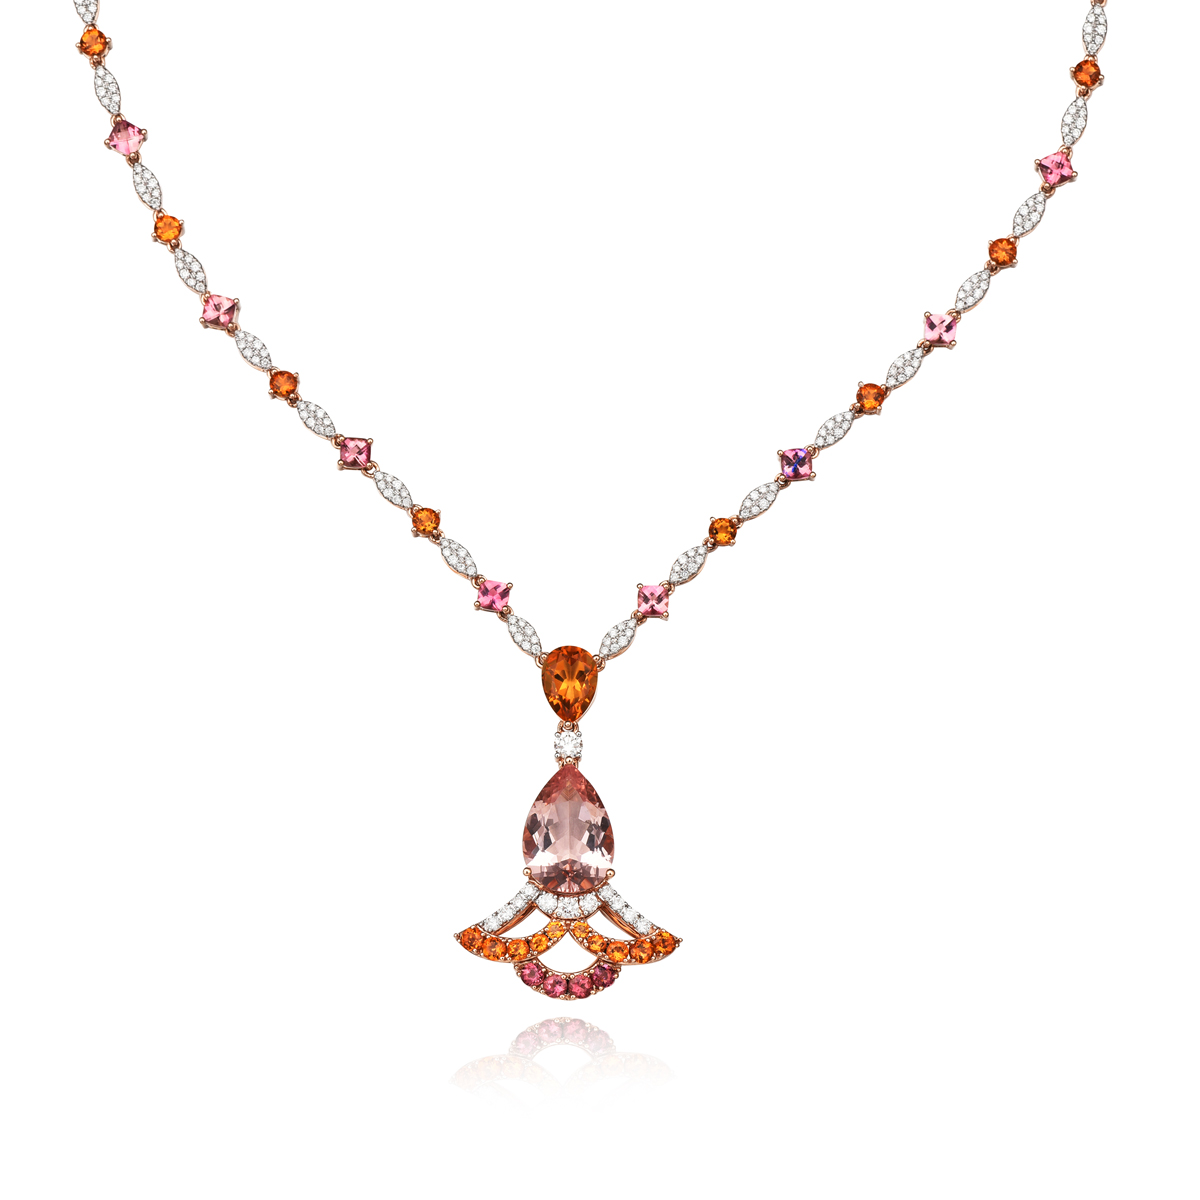 peplum舞裙系列18k金摩根石黄晶项链